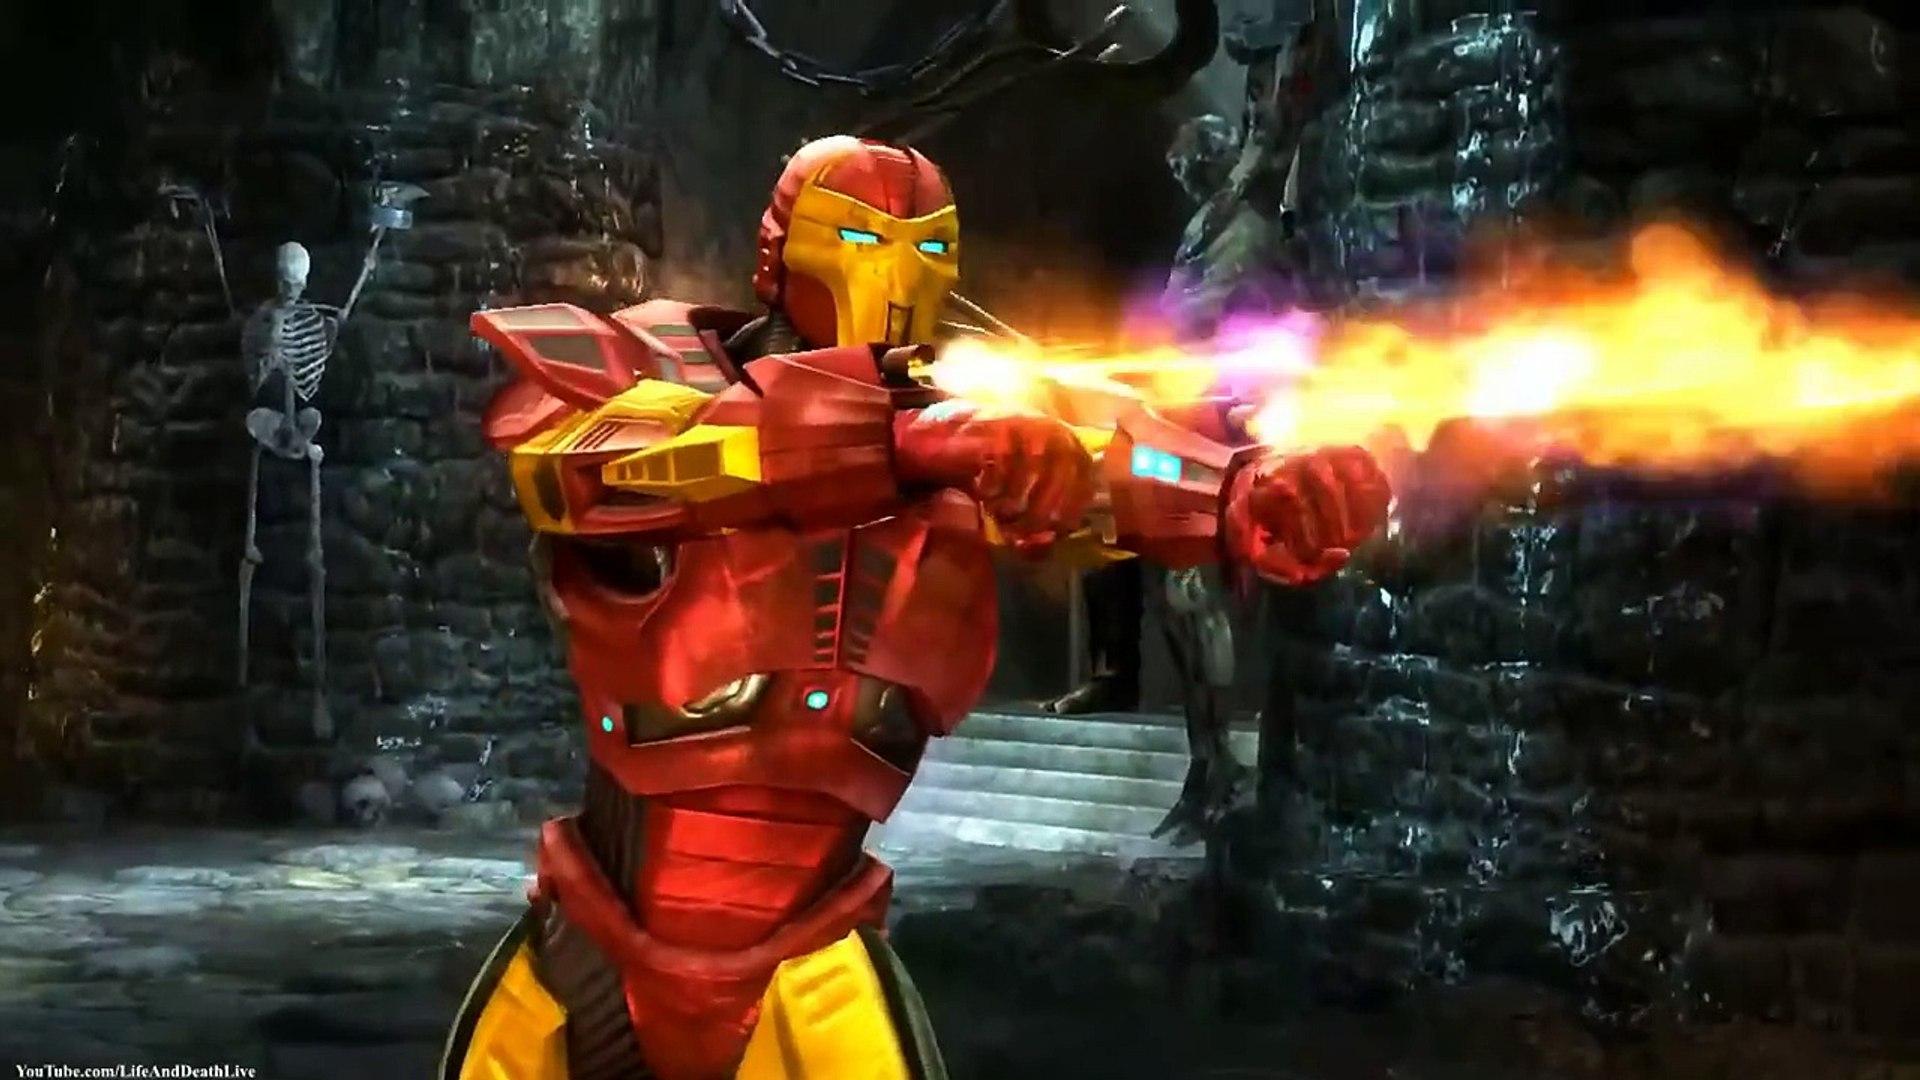 Mortal Kombat Komplete Edition - Sektor - Iron Man Costume/Skin *Mod* (HD)